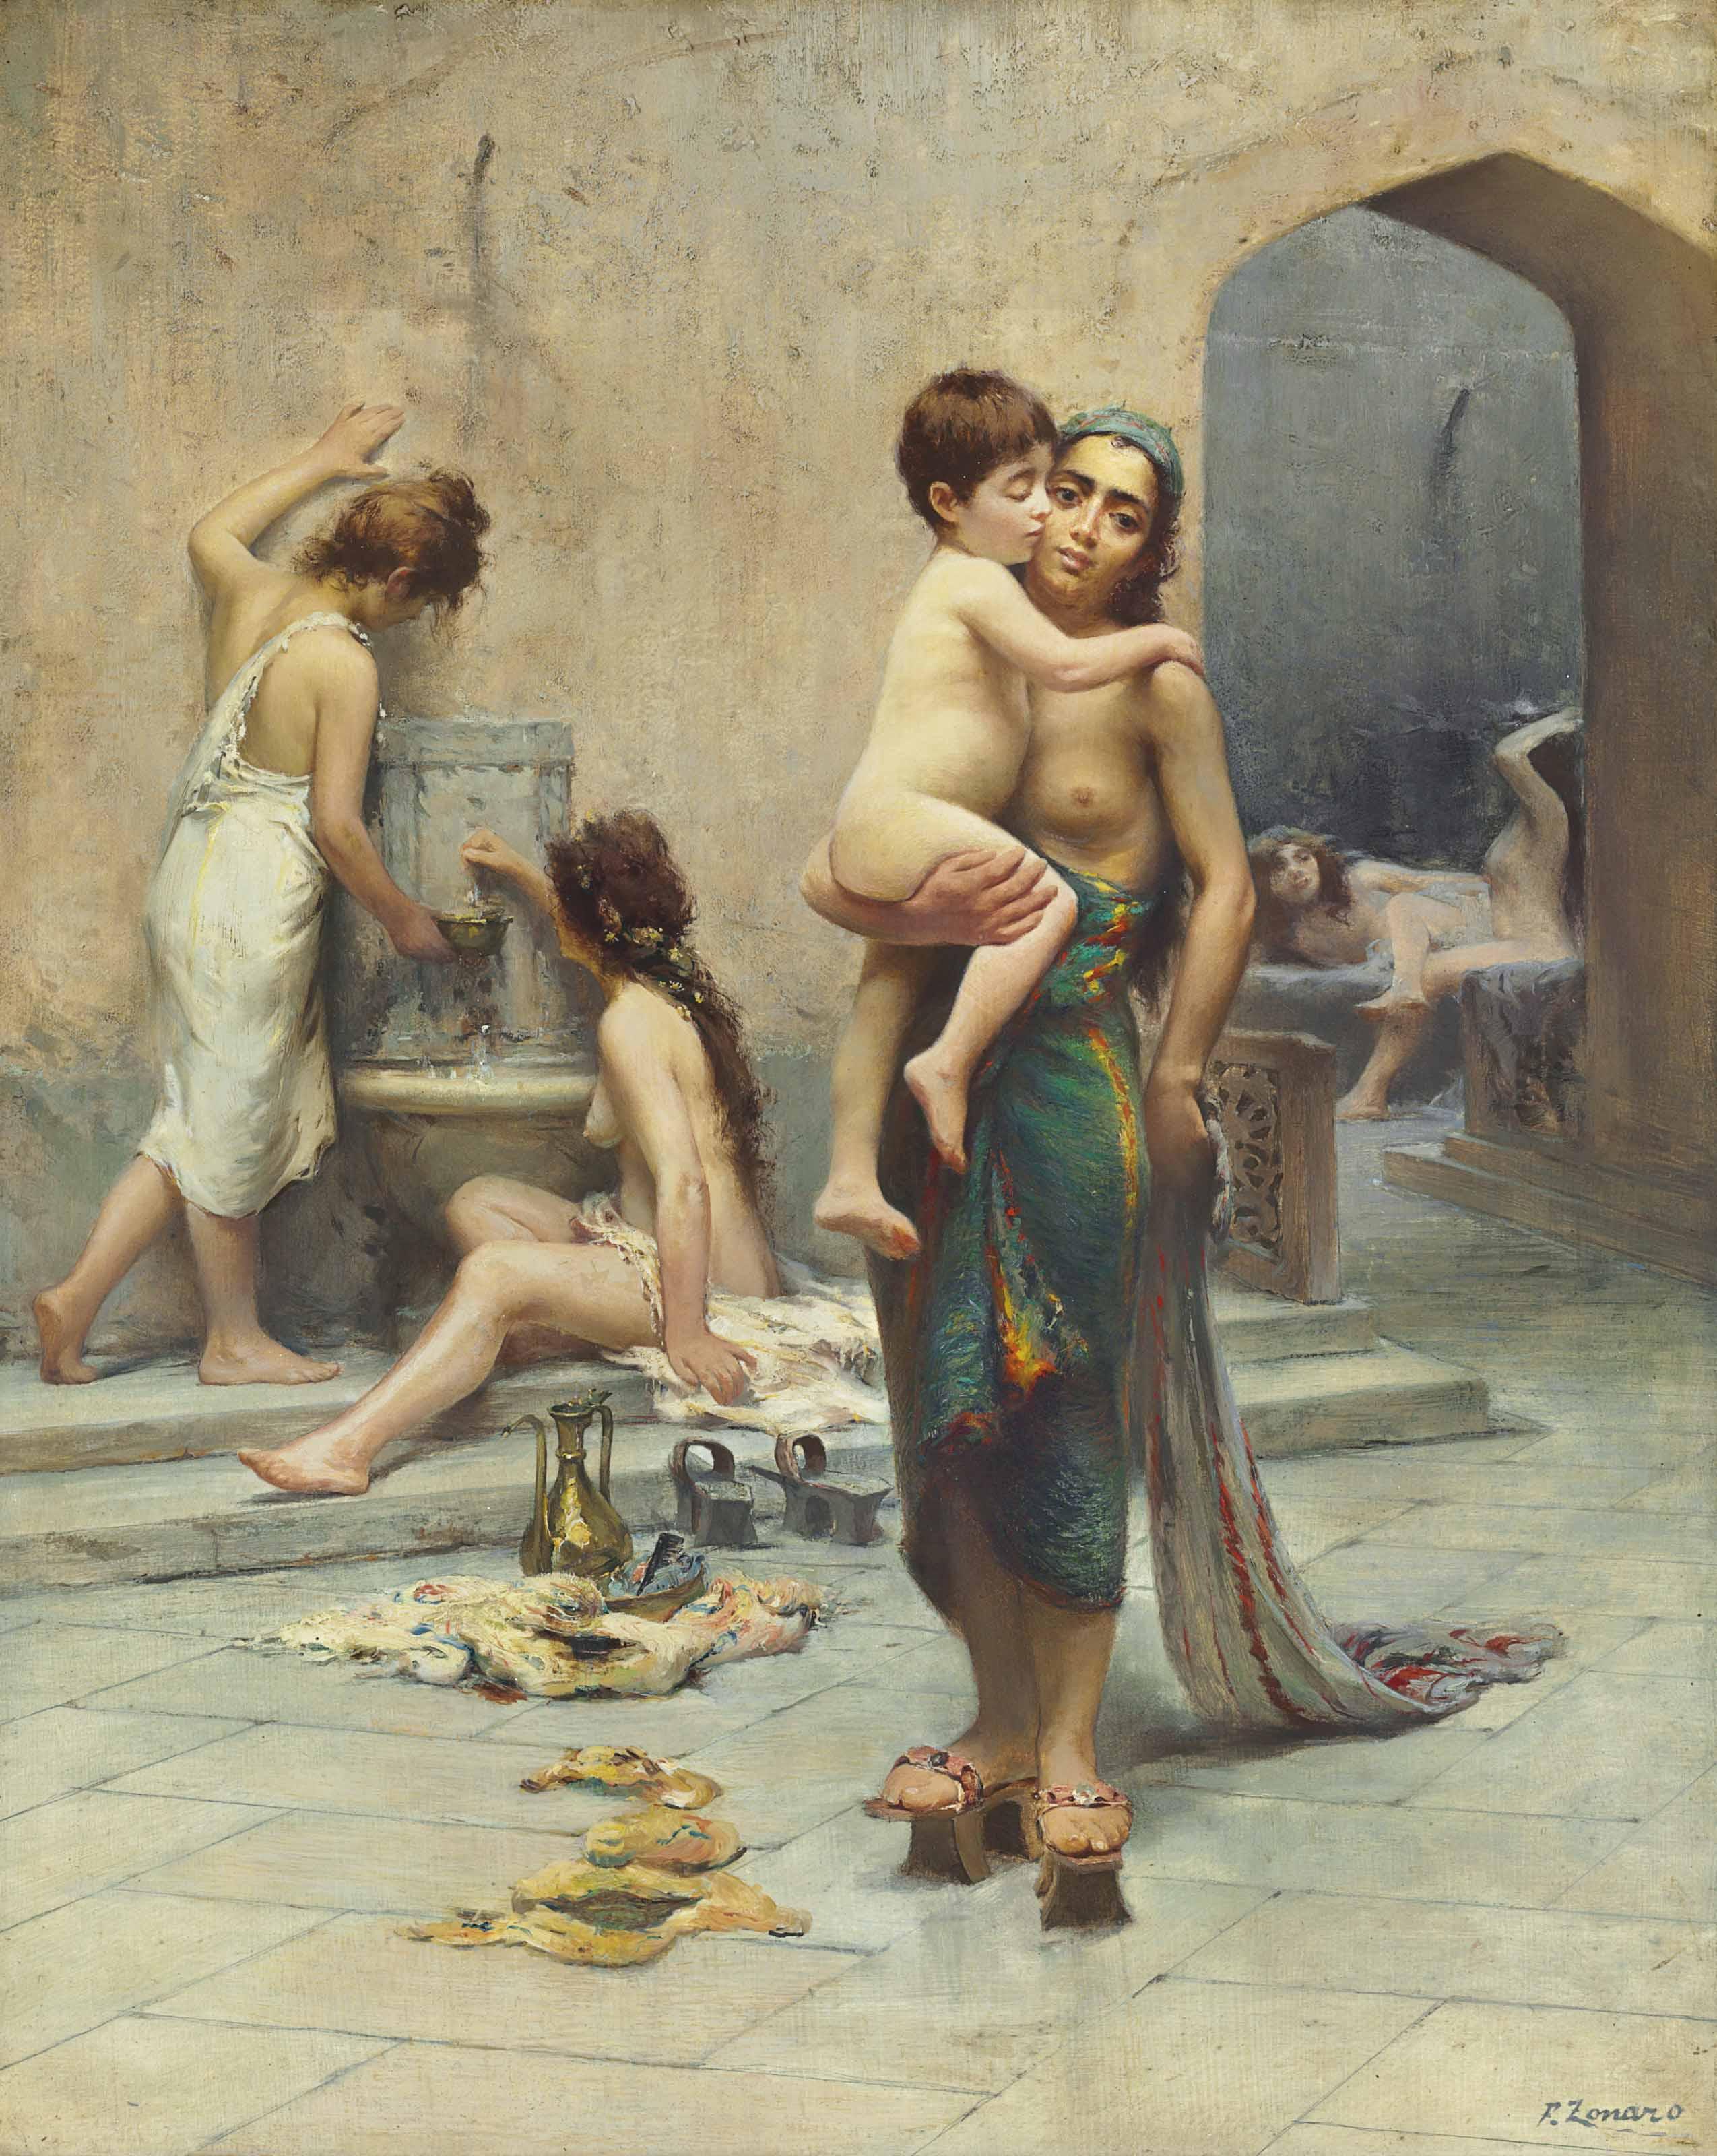 Hamam - il bagno